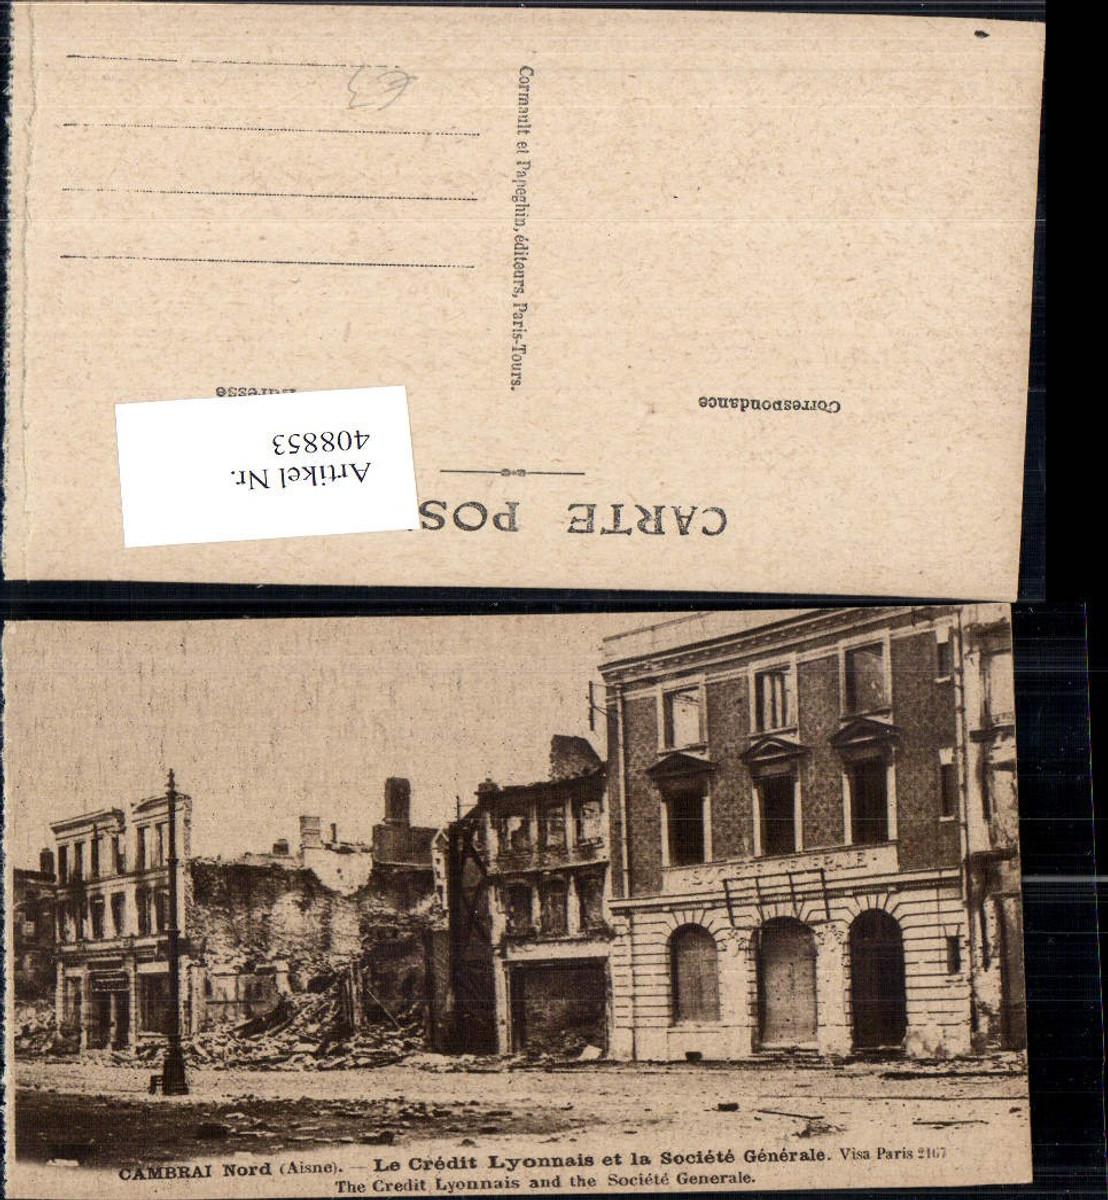 408853,WW1 Zerstörte Gebäude Cambrai Nord Aisne Le Credit Lyonnais et la Societe Generale günstig online kaufen